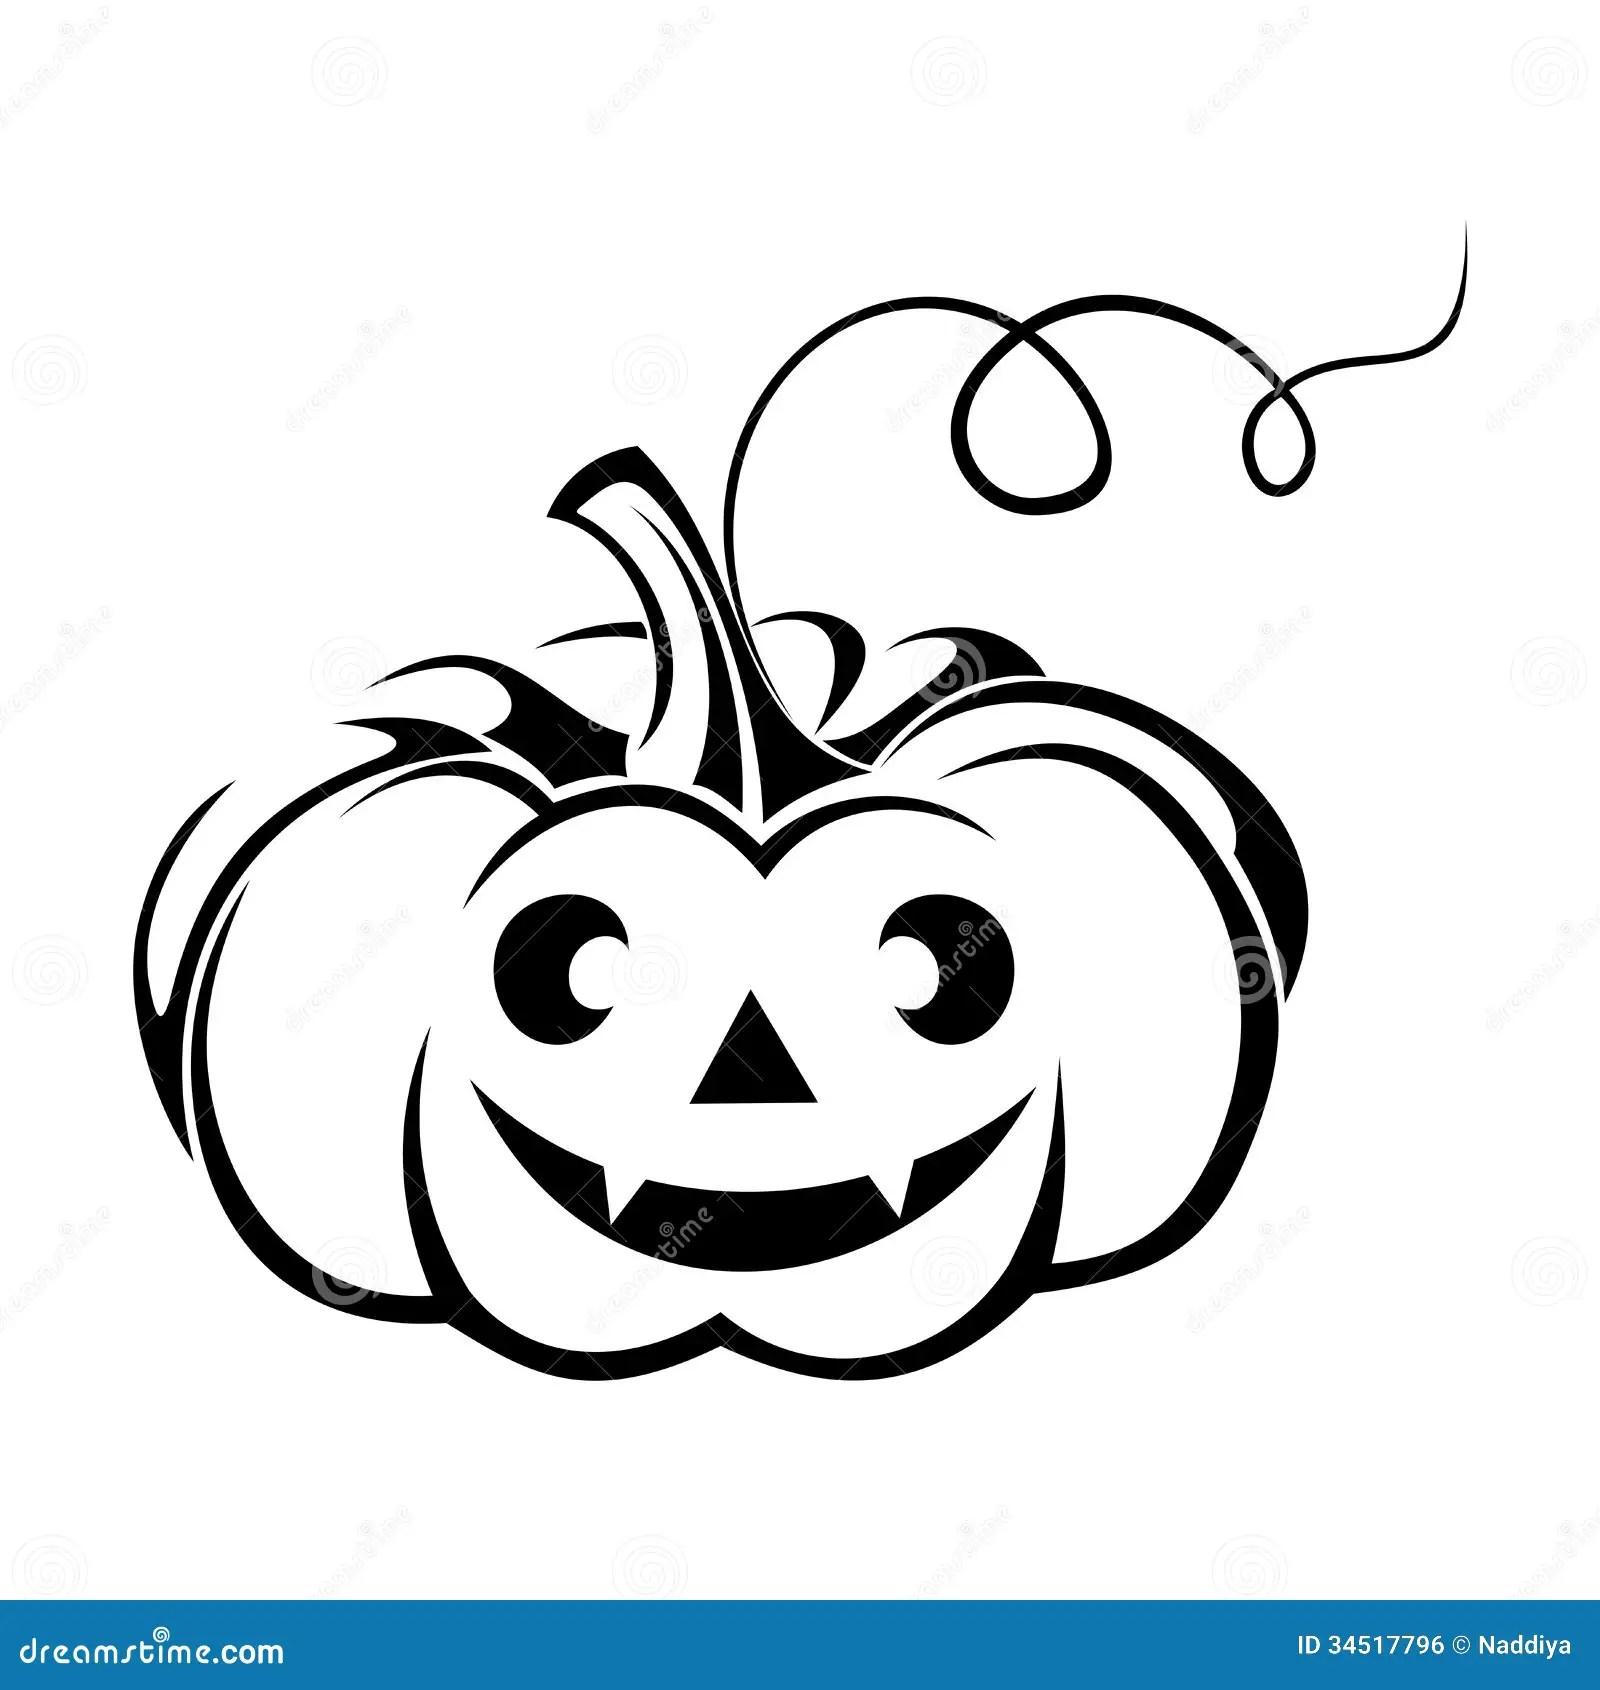 Black Silhouette Of Jack O Lantern Halloween Pump Royalty Free Stock Image